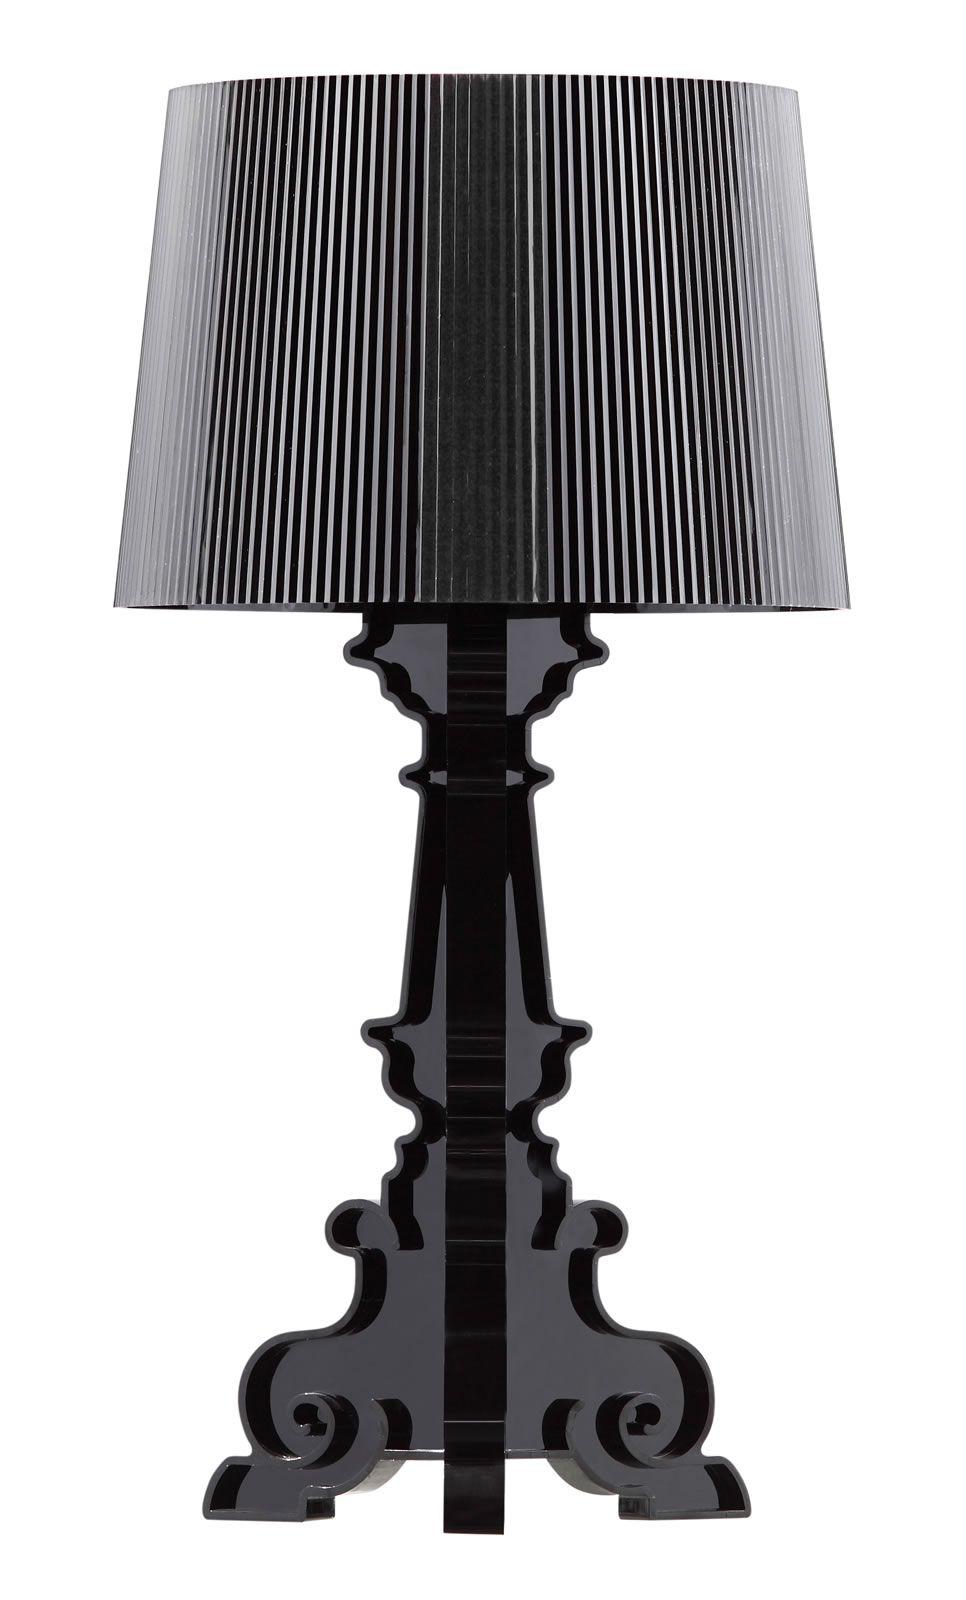 Modern Acrylic Table Lamp - centerpiece ideas | DIY | Pinterest ...